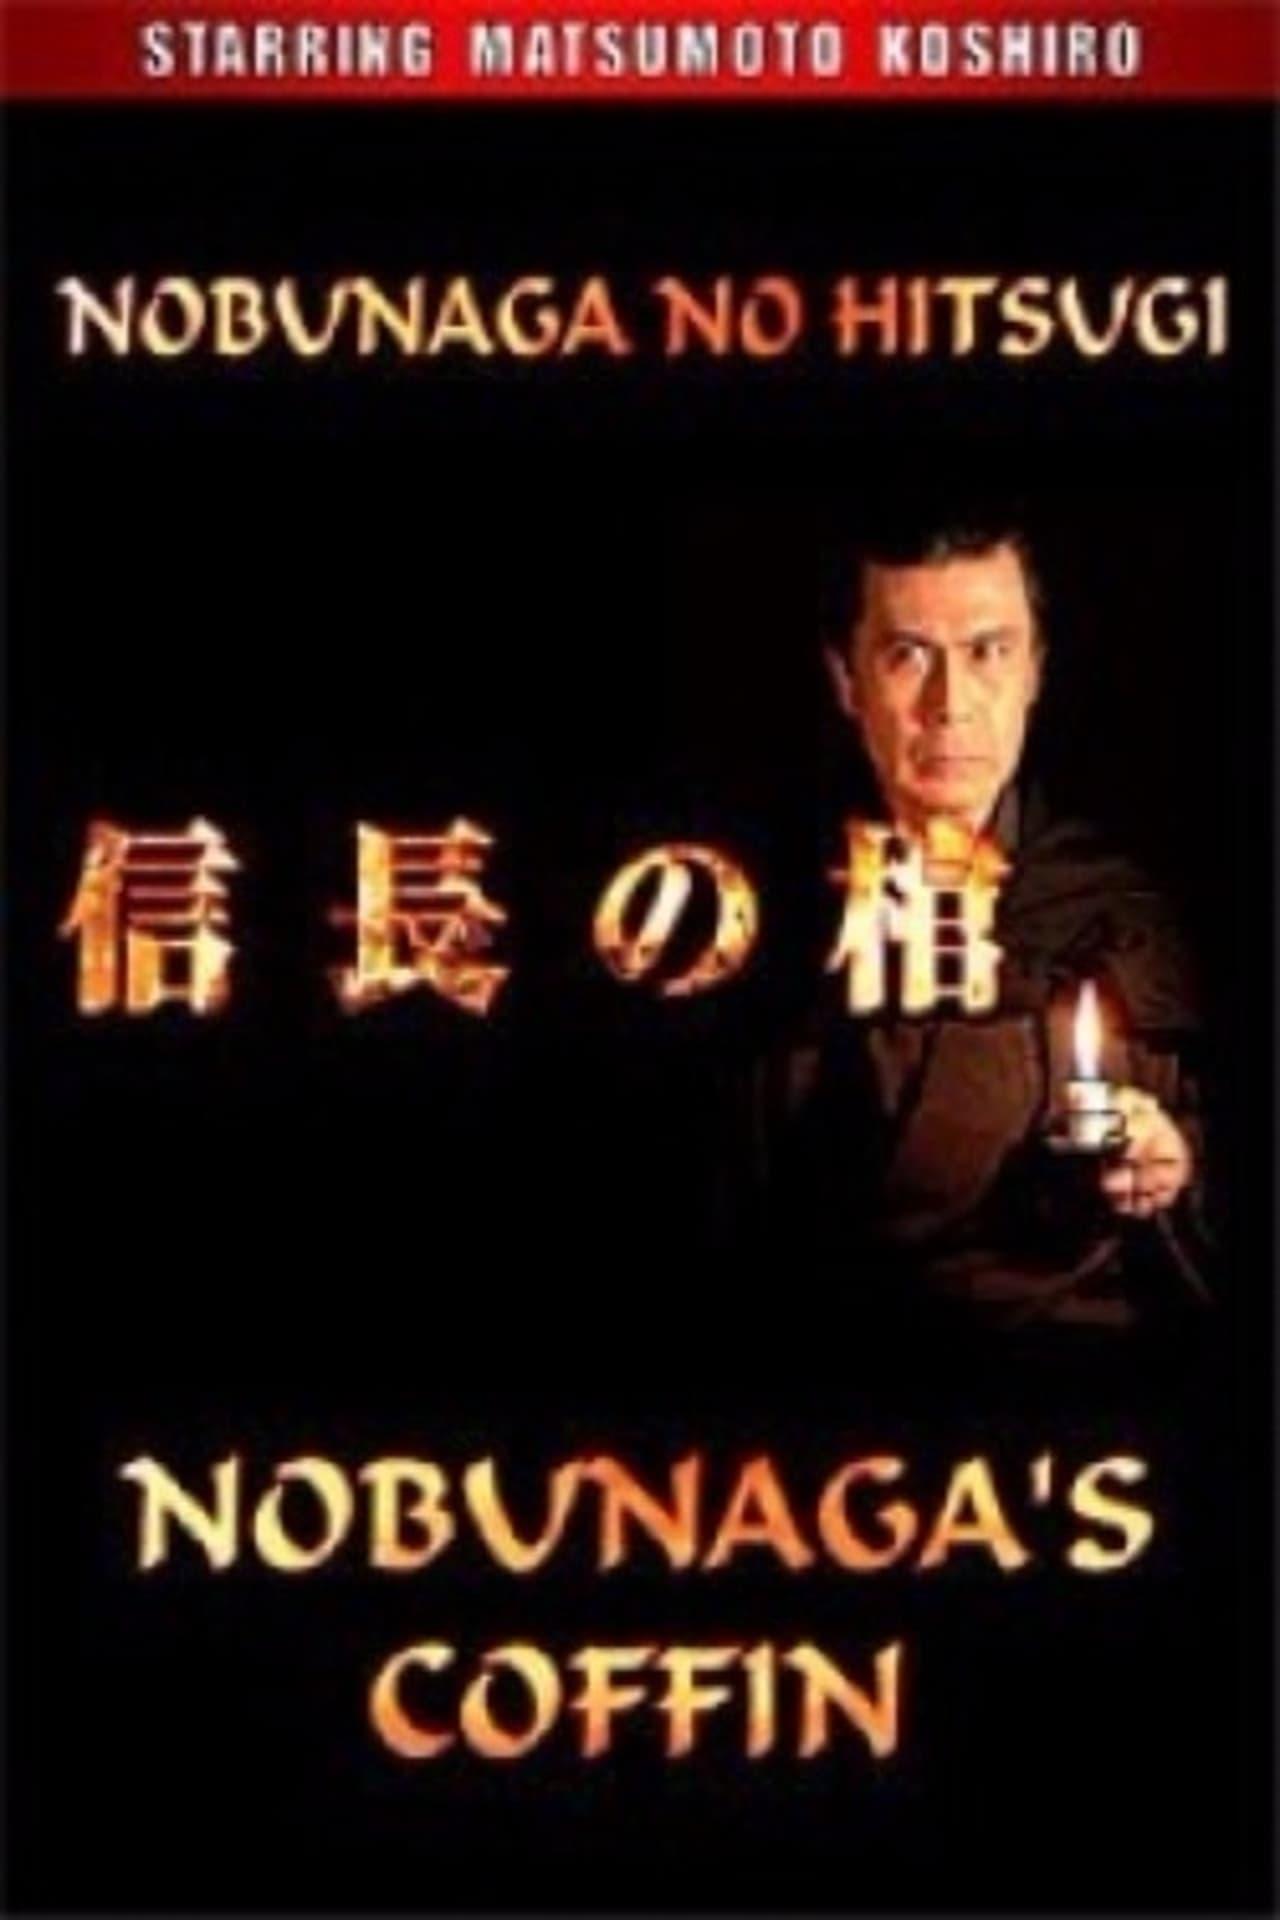 Nobunaga's Coffin